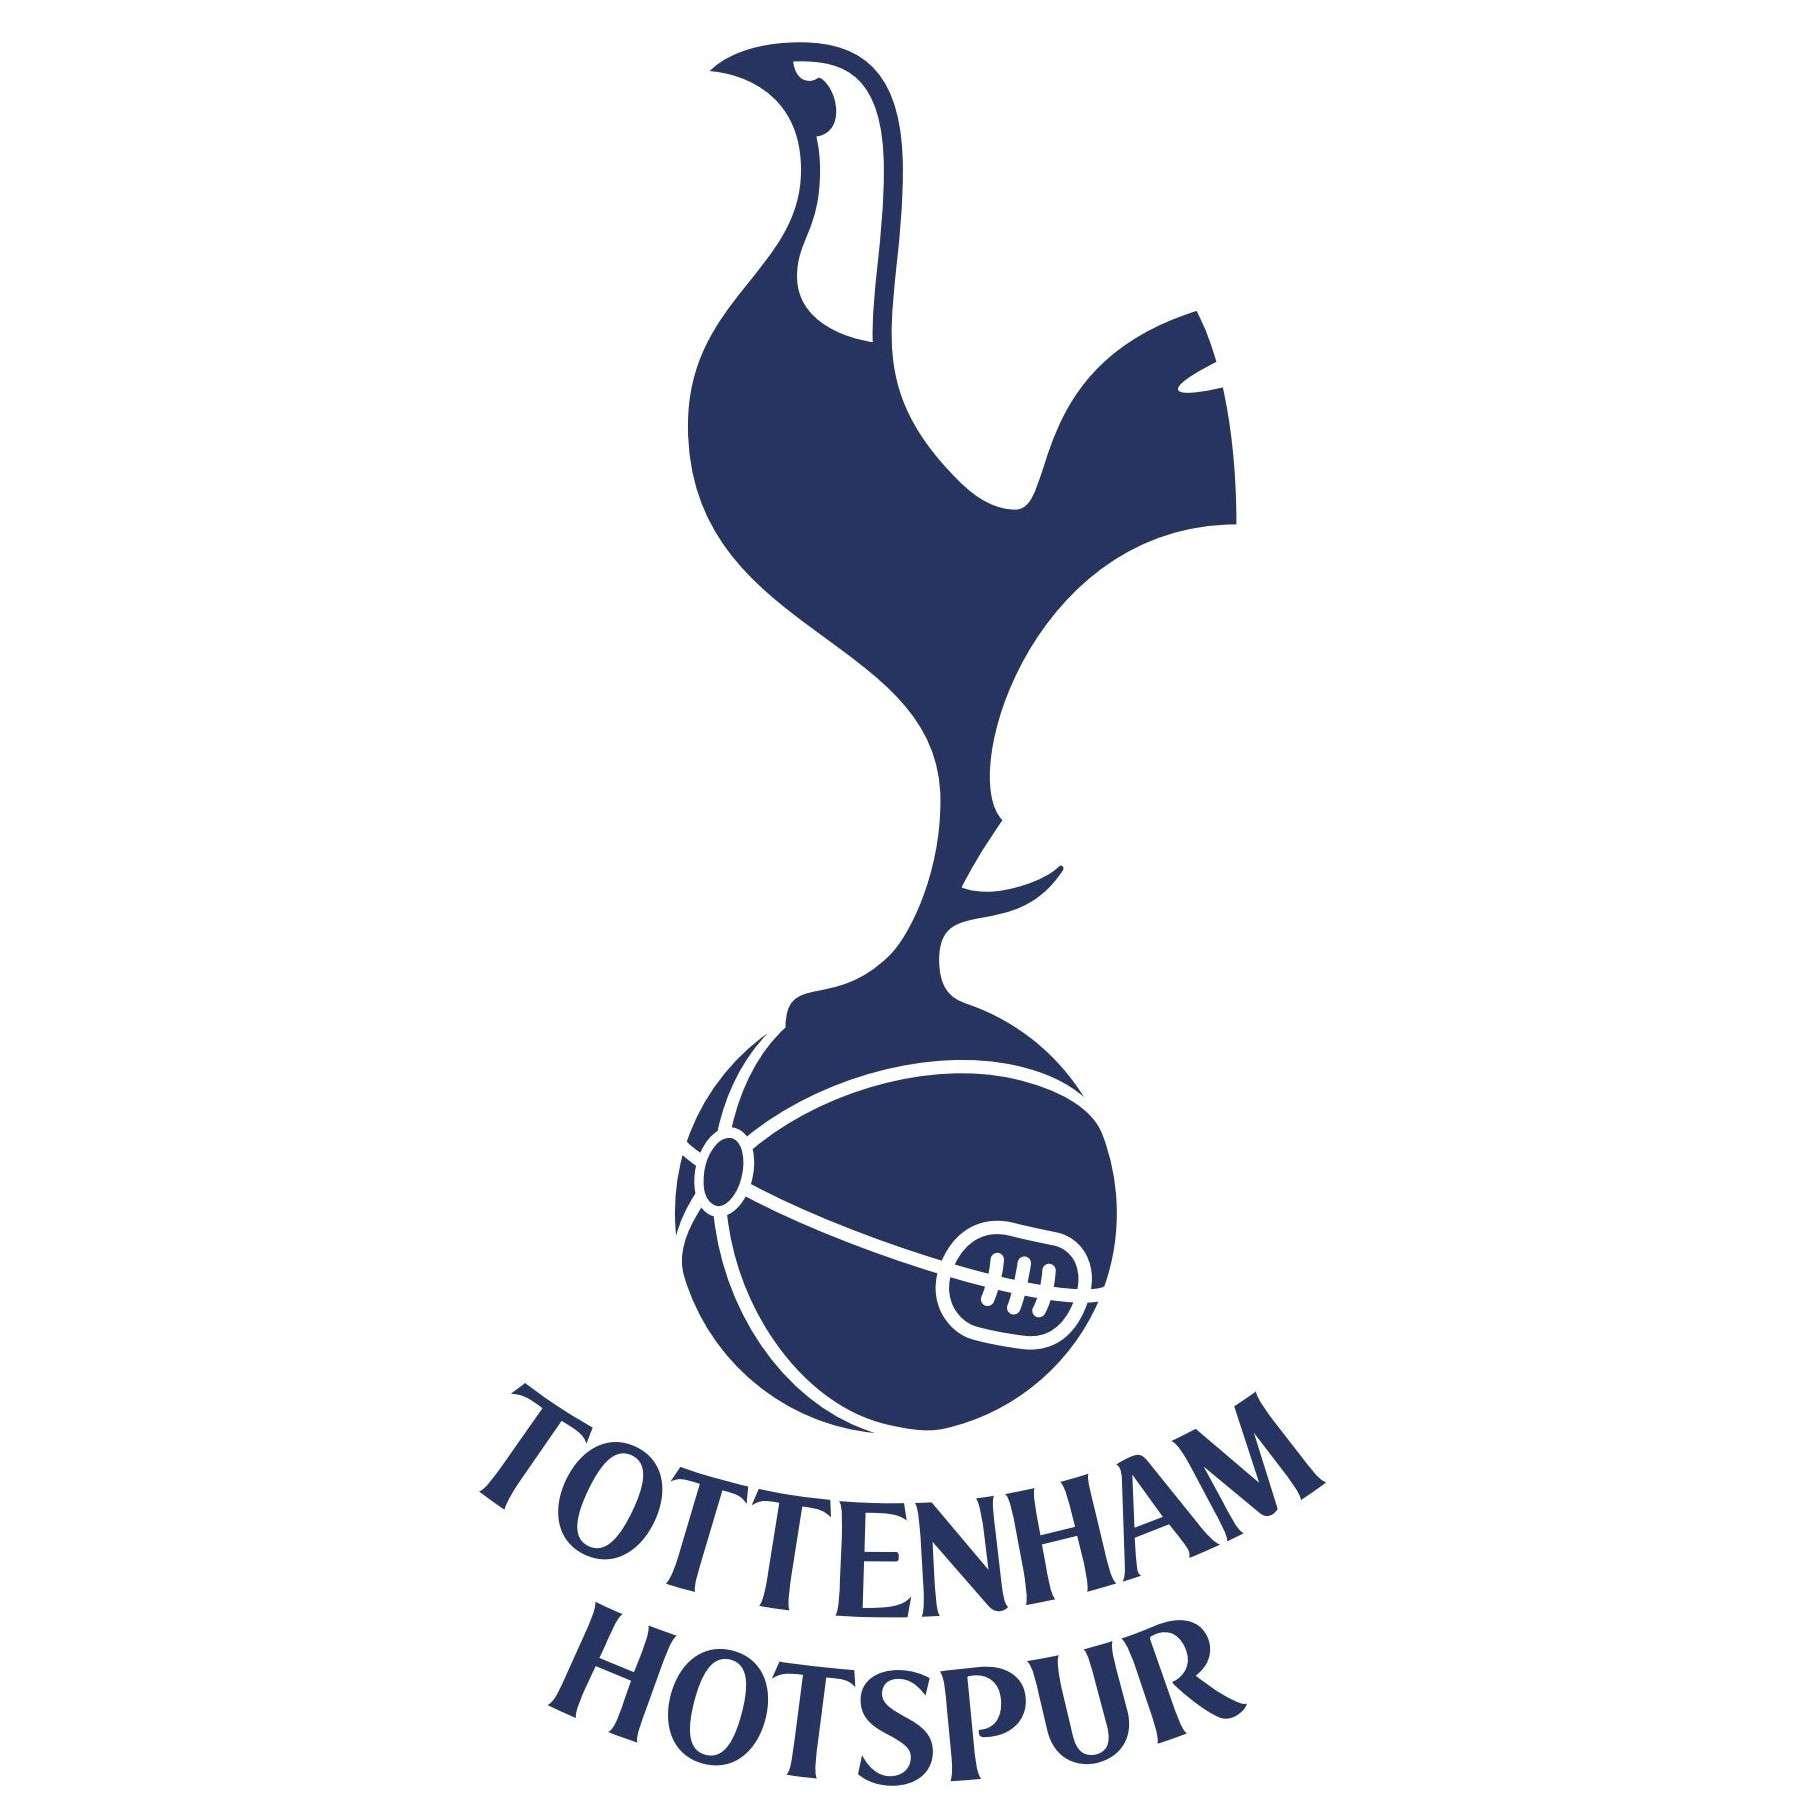 Tottenham-Hotspur-Football-Club-Logo